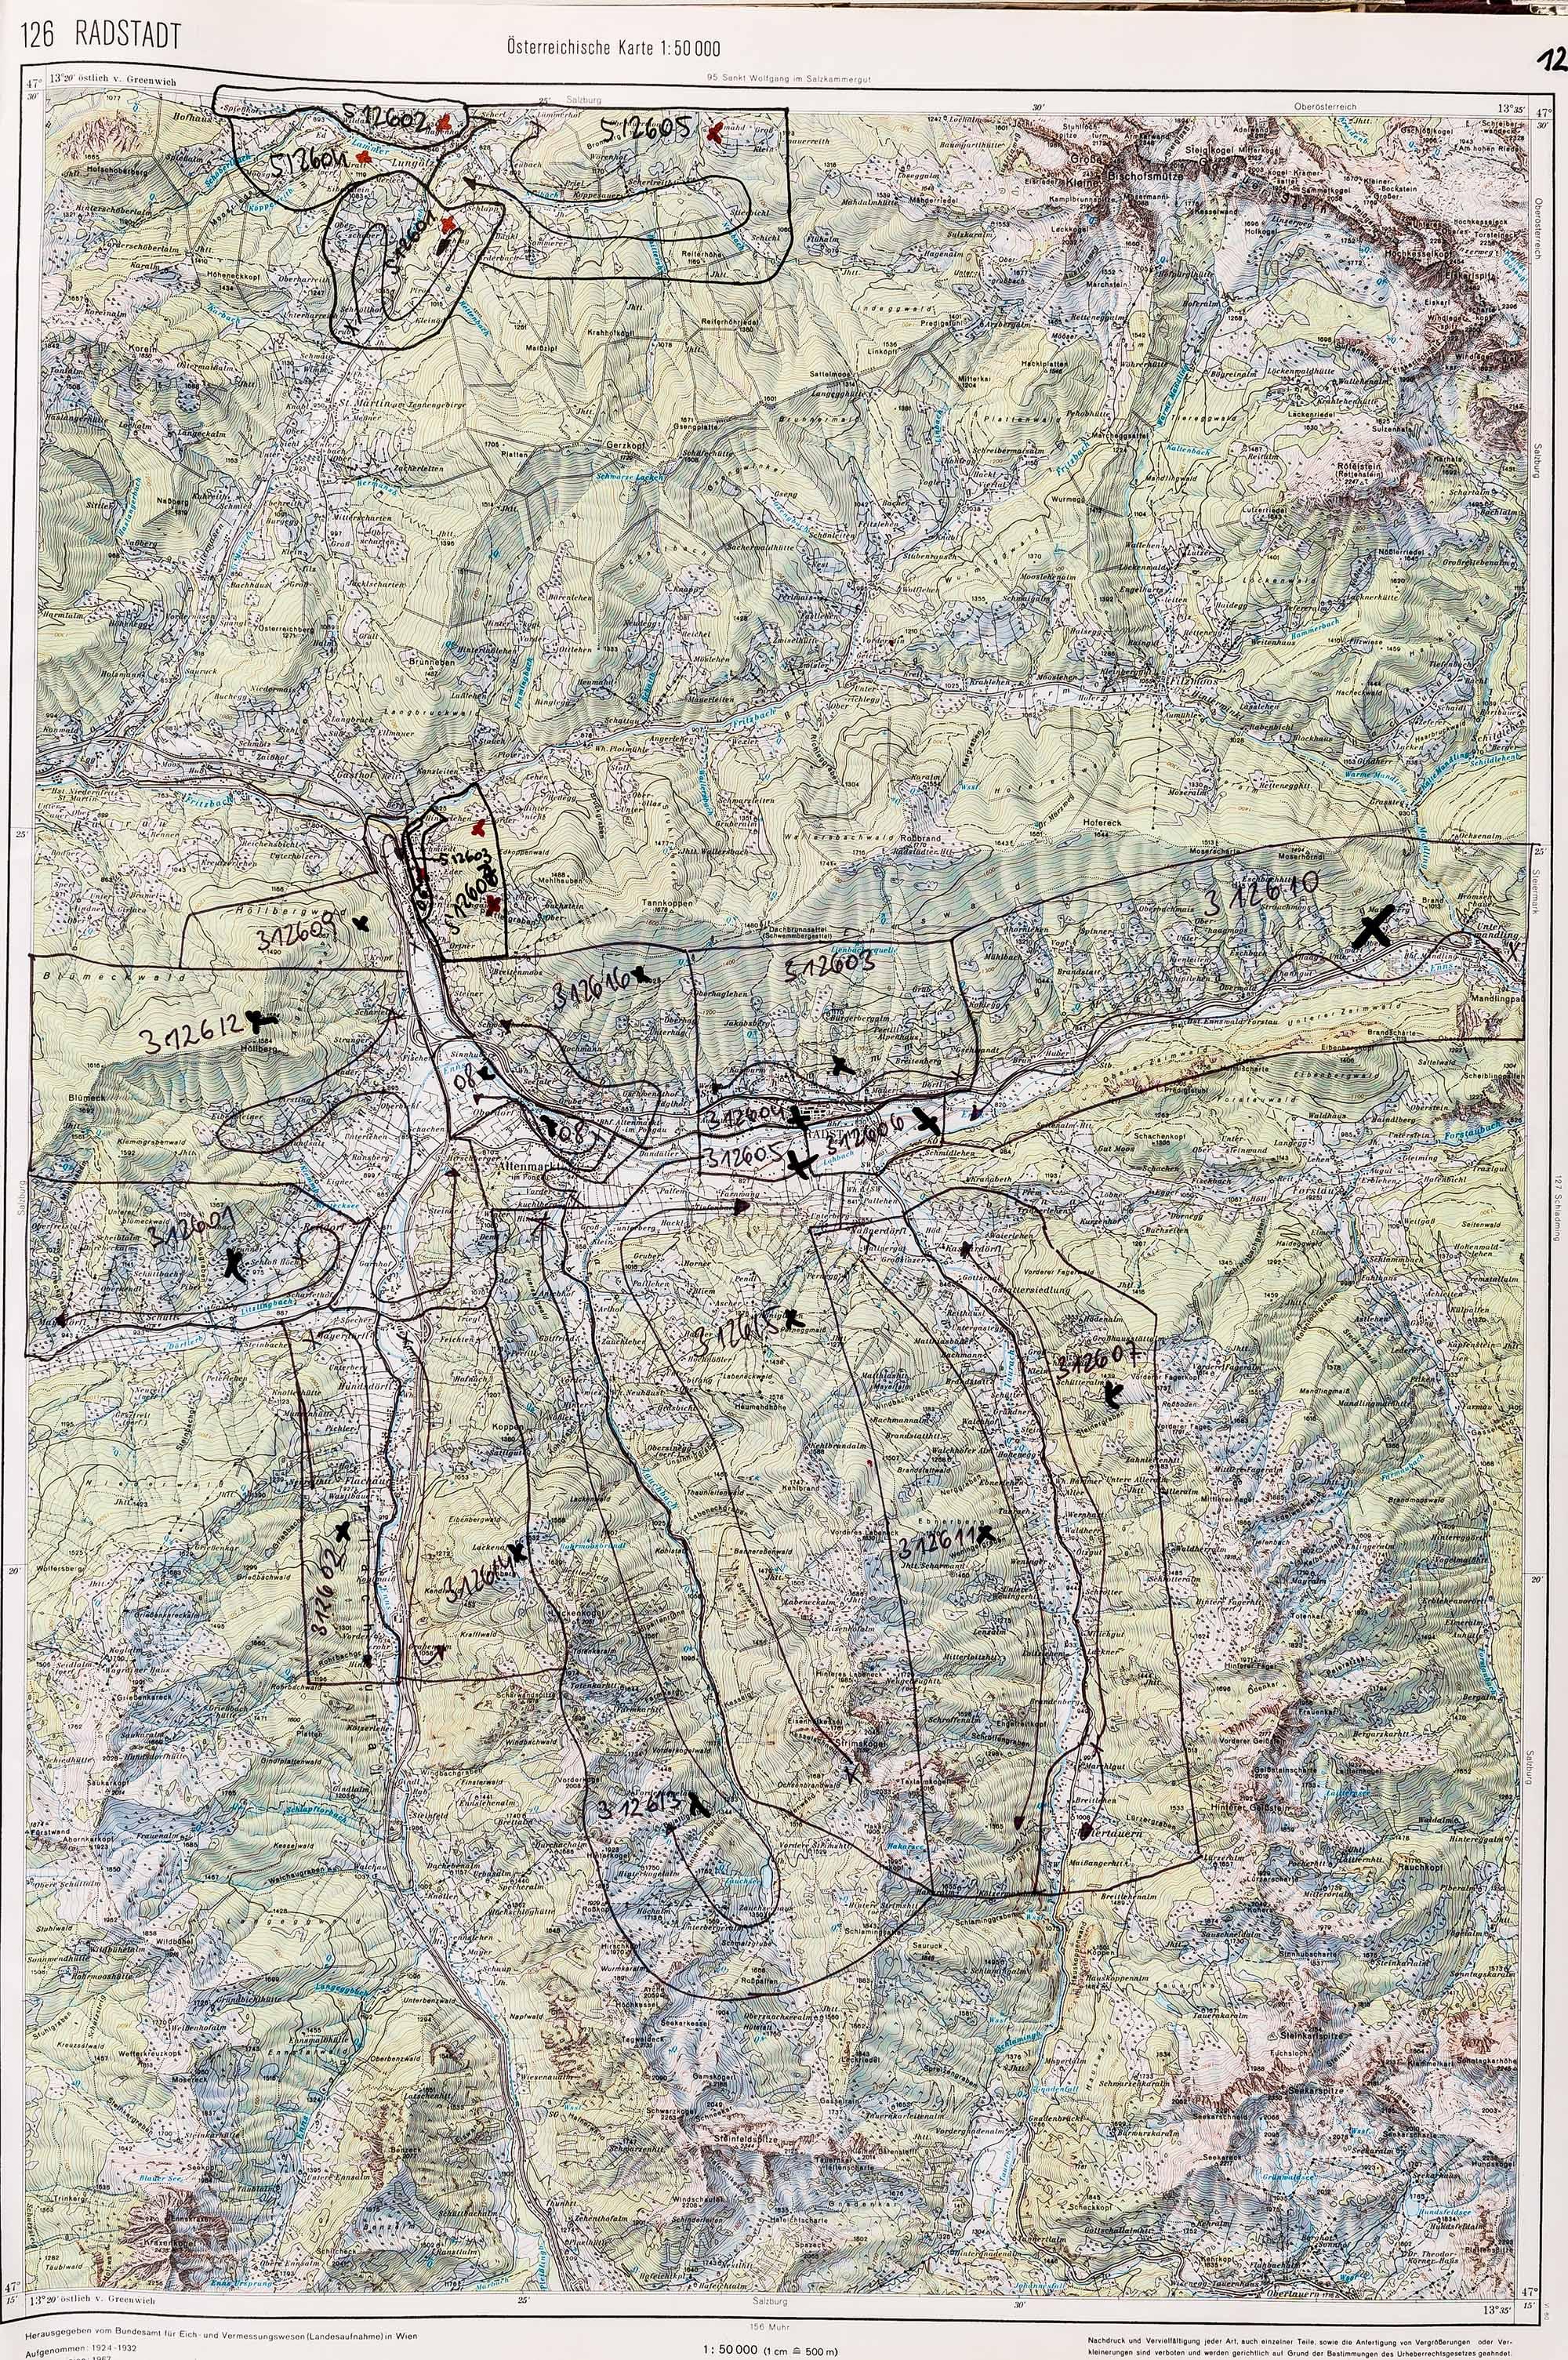 1983-1986 Karte 126